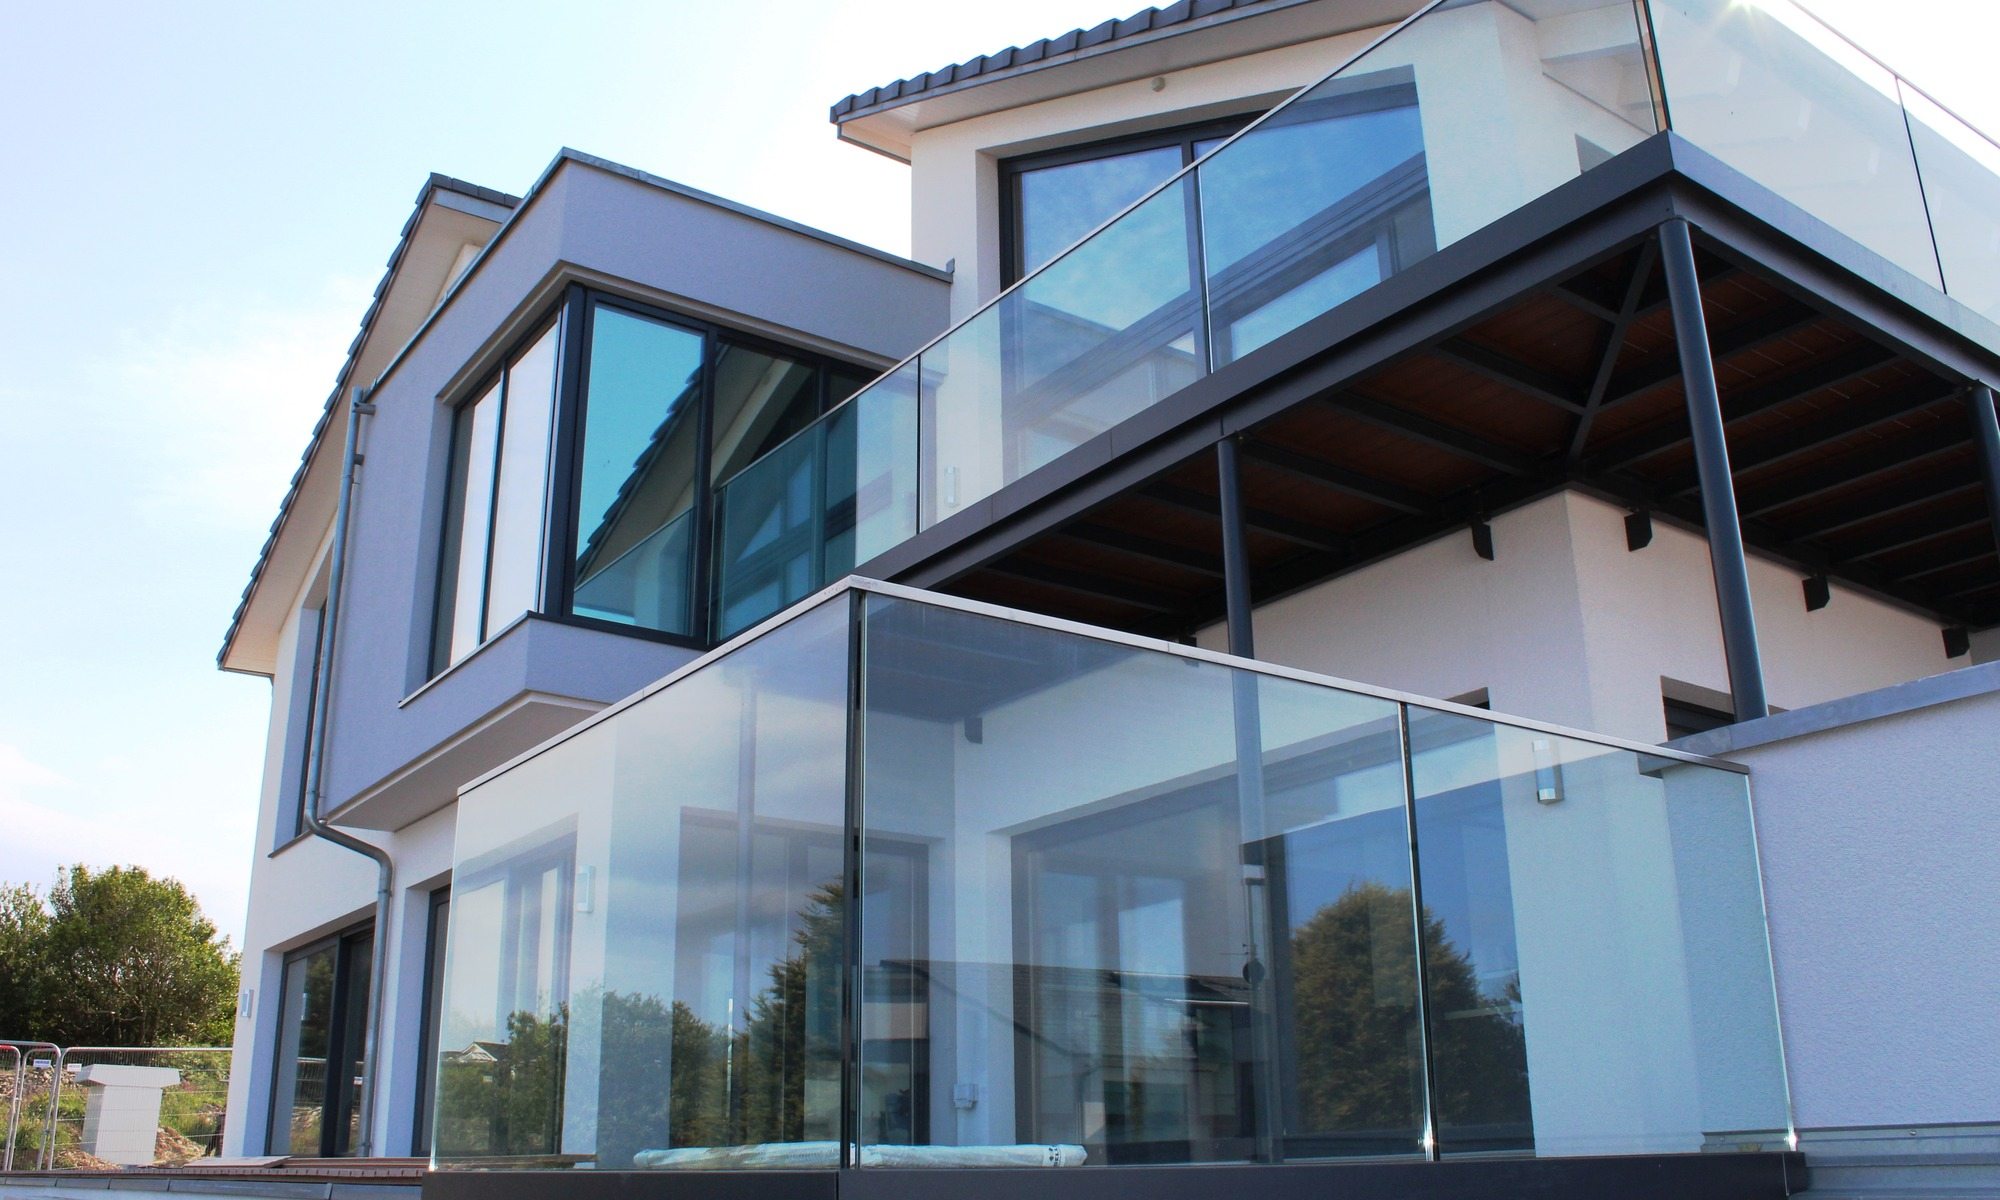 Eco-friendly, architect-designed modular homes